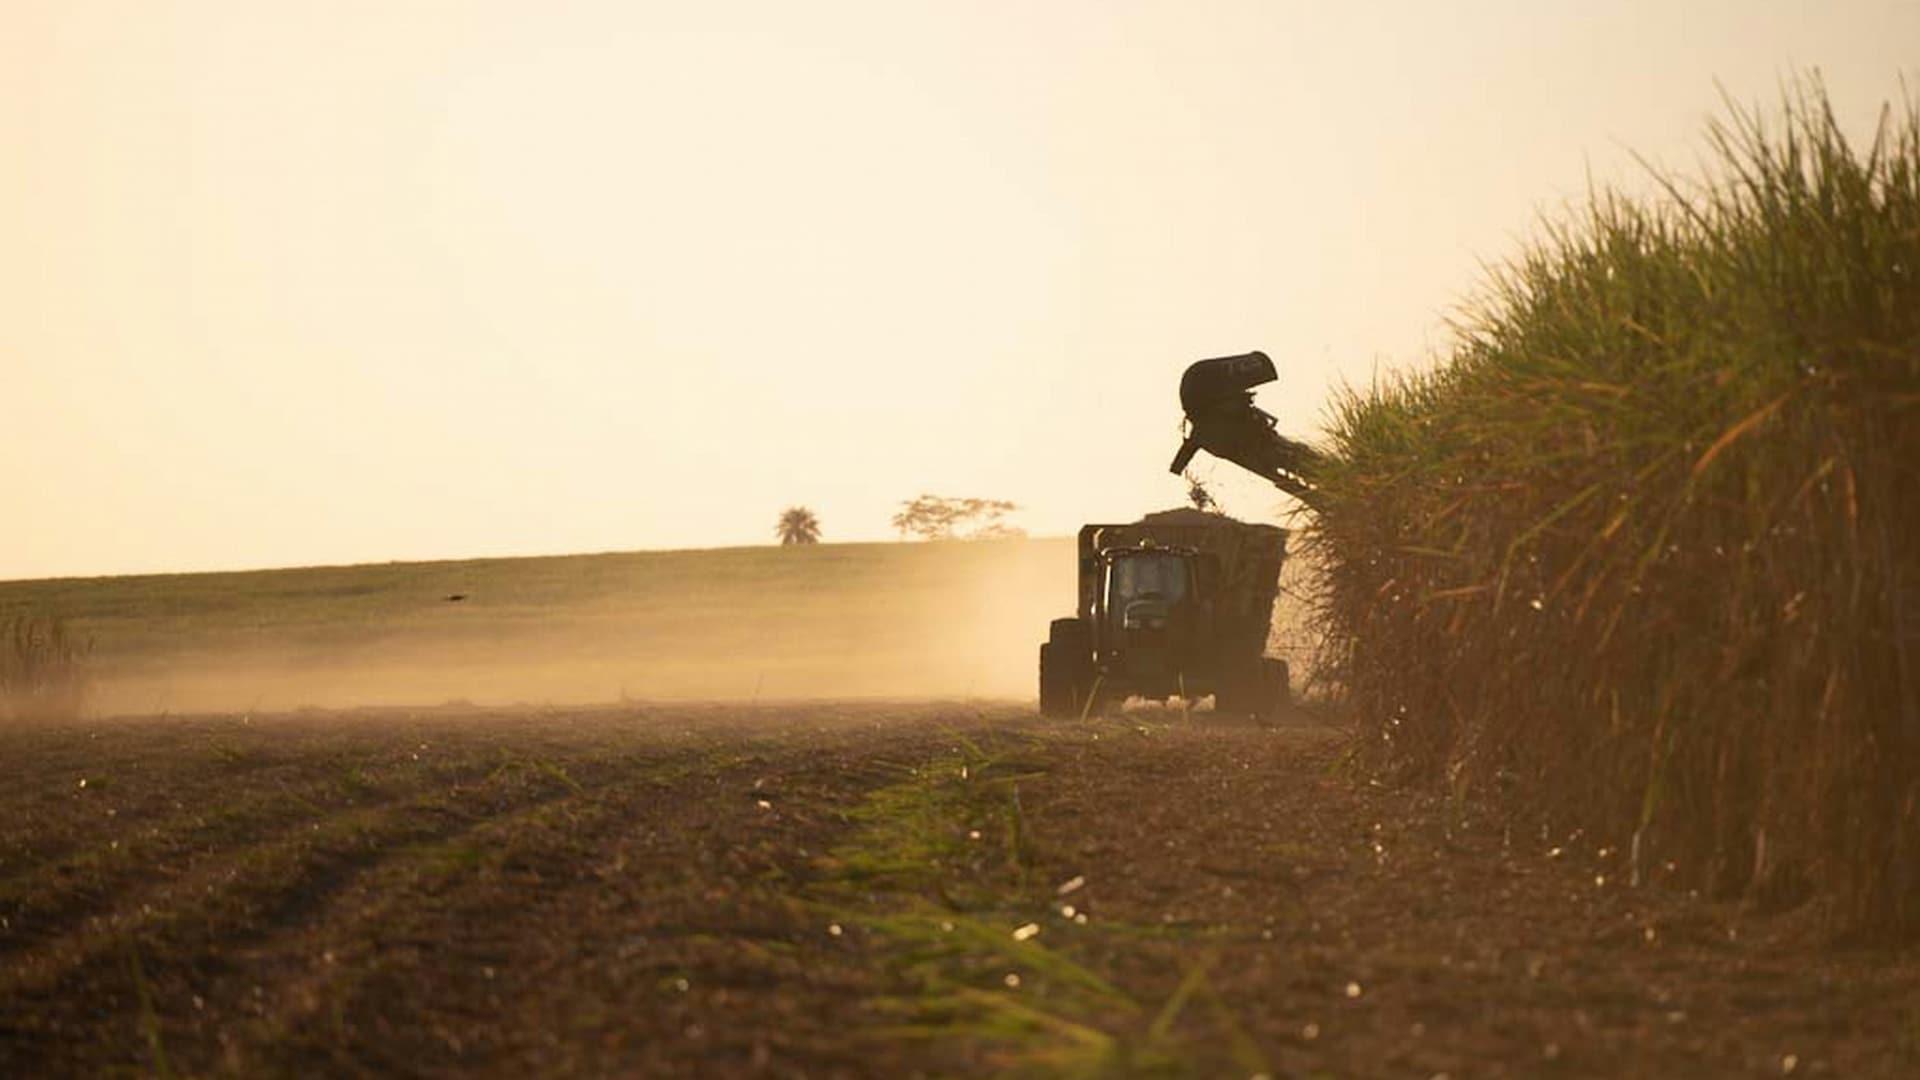 John Deere sugar cane harvester moving through a field.